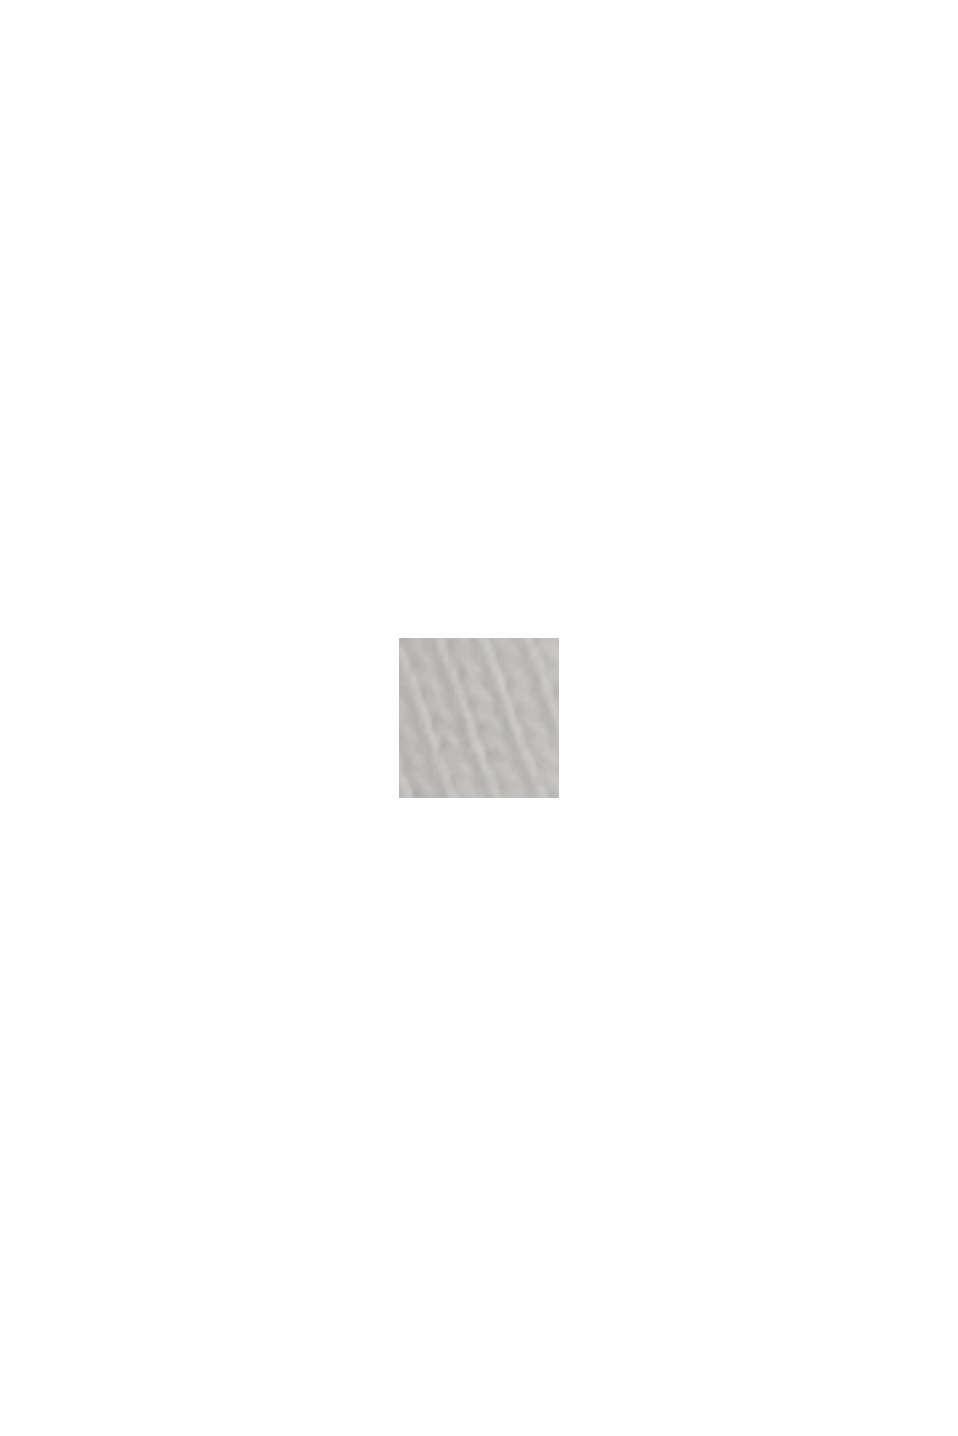 #ReimagineFlexibility: Maglia in jersey con stampa reflect, OFF WHITE, swatch